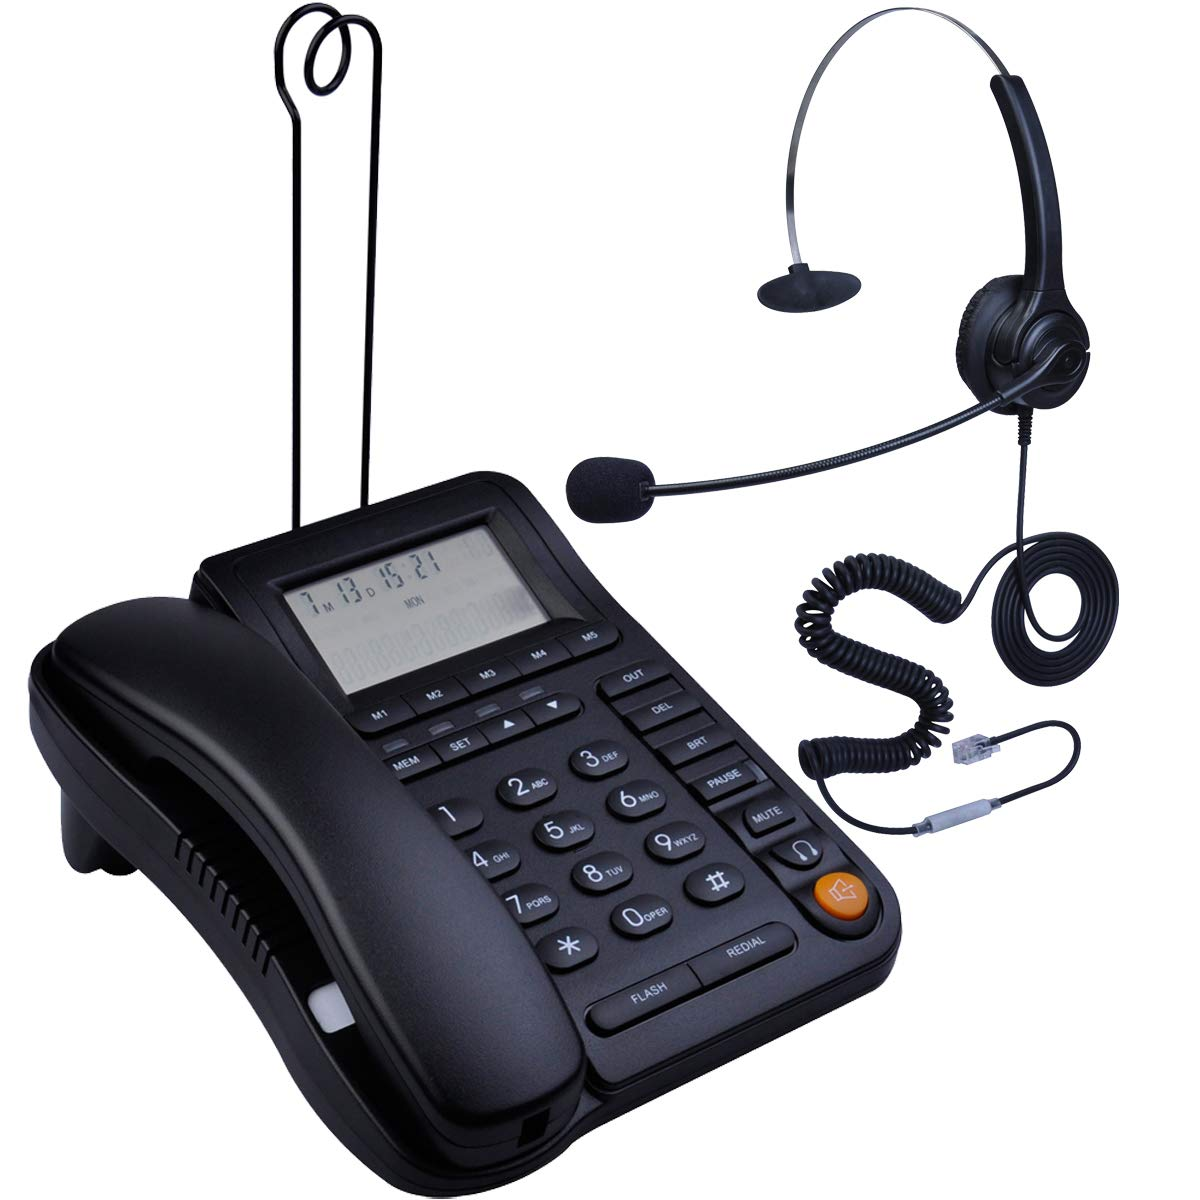 HePesTer P 017BN 2 Speakerphone Landline Telephone